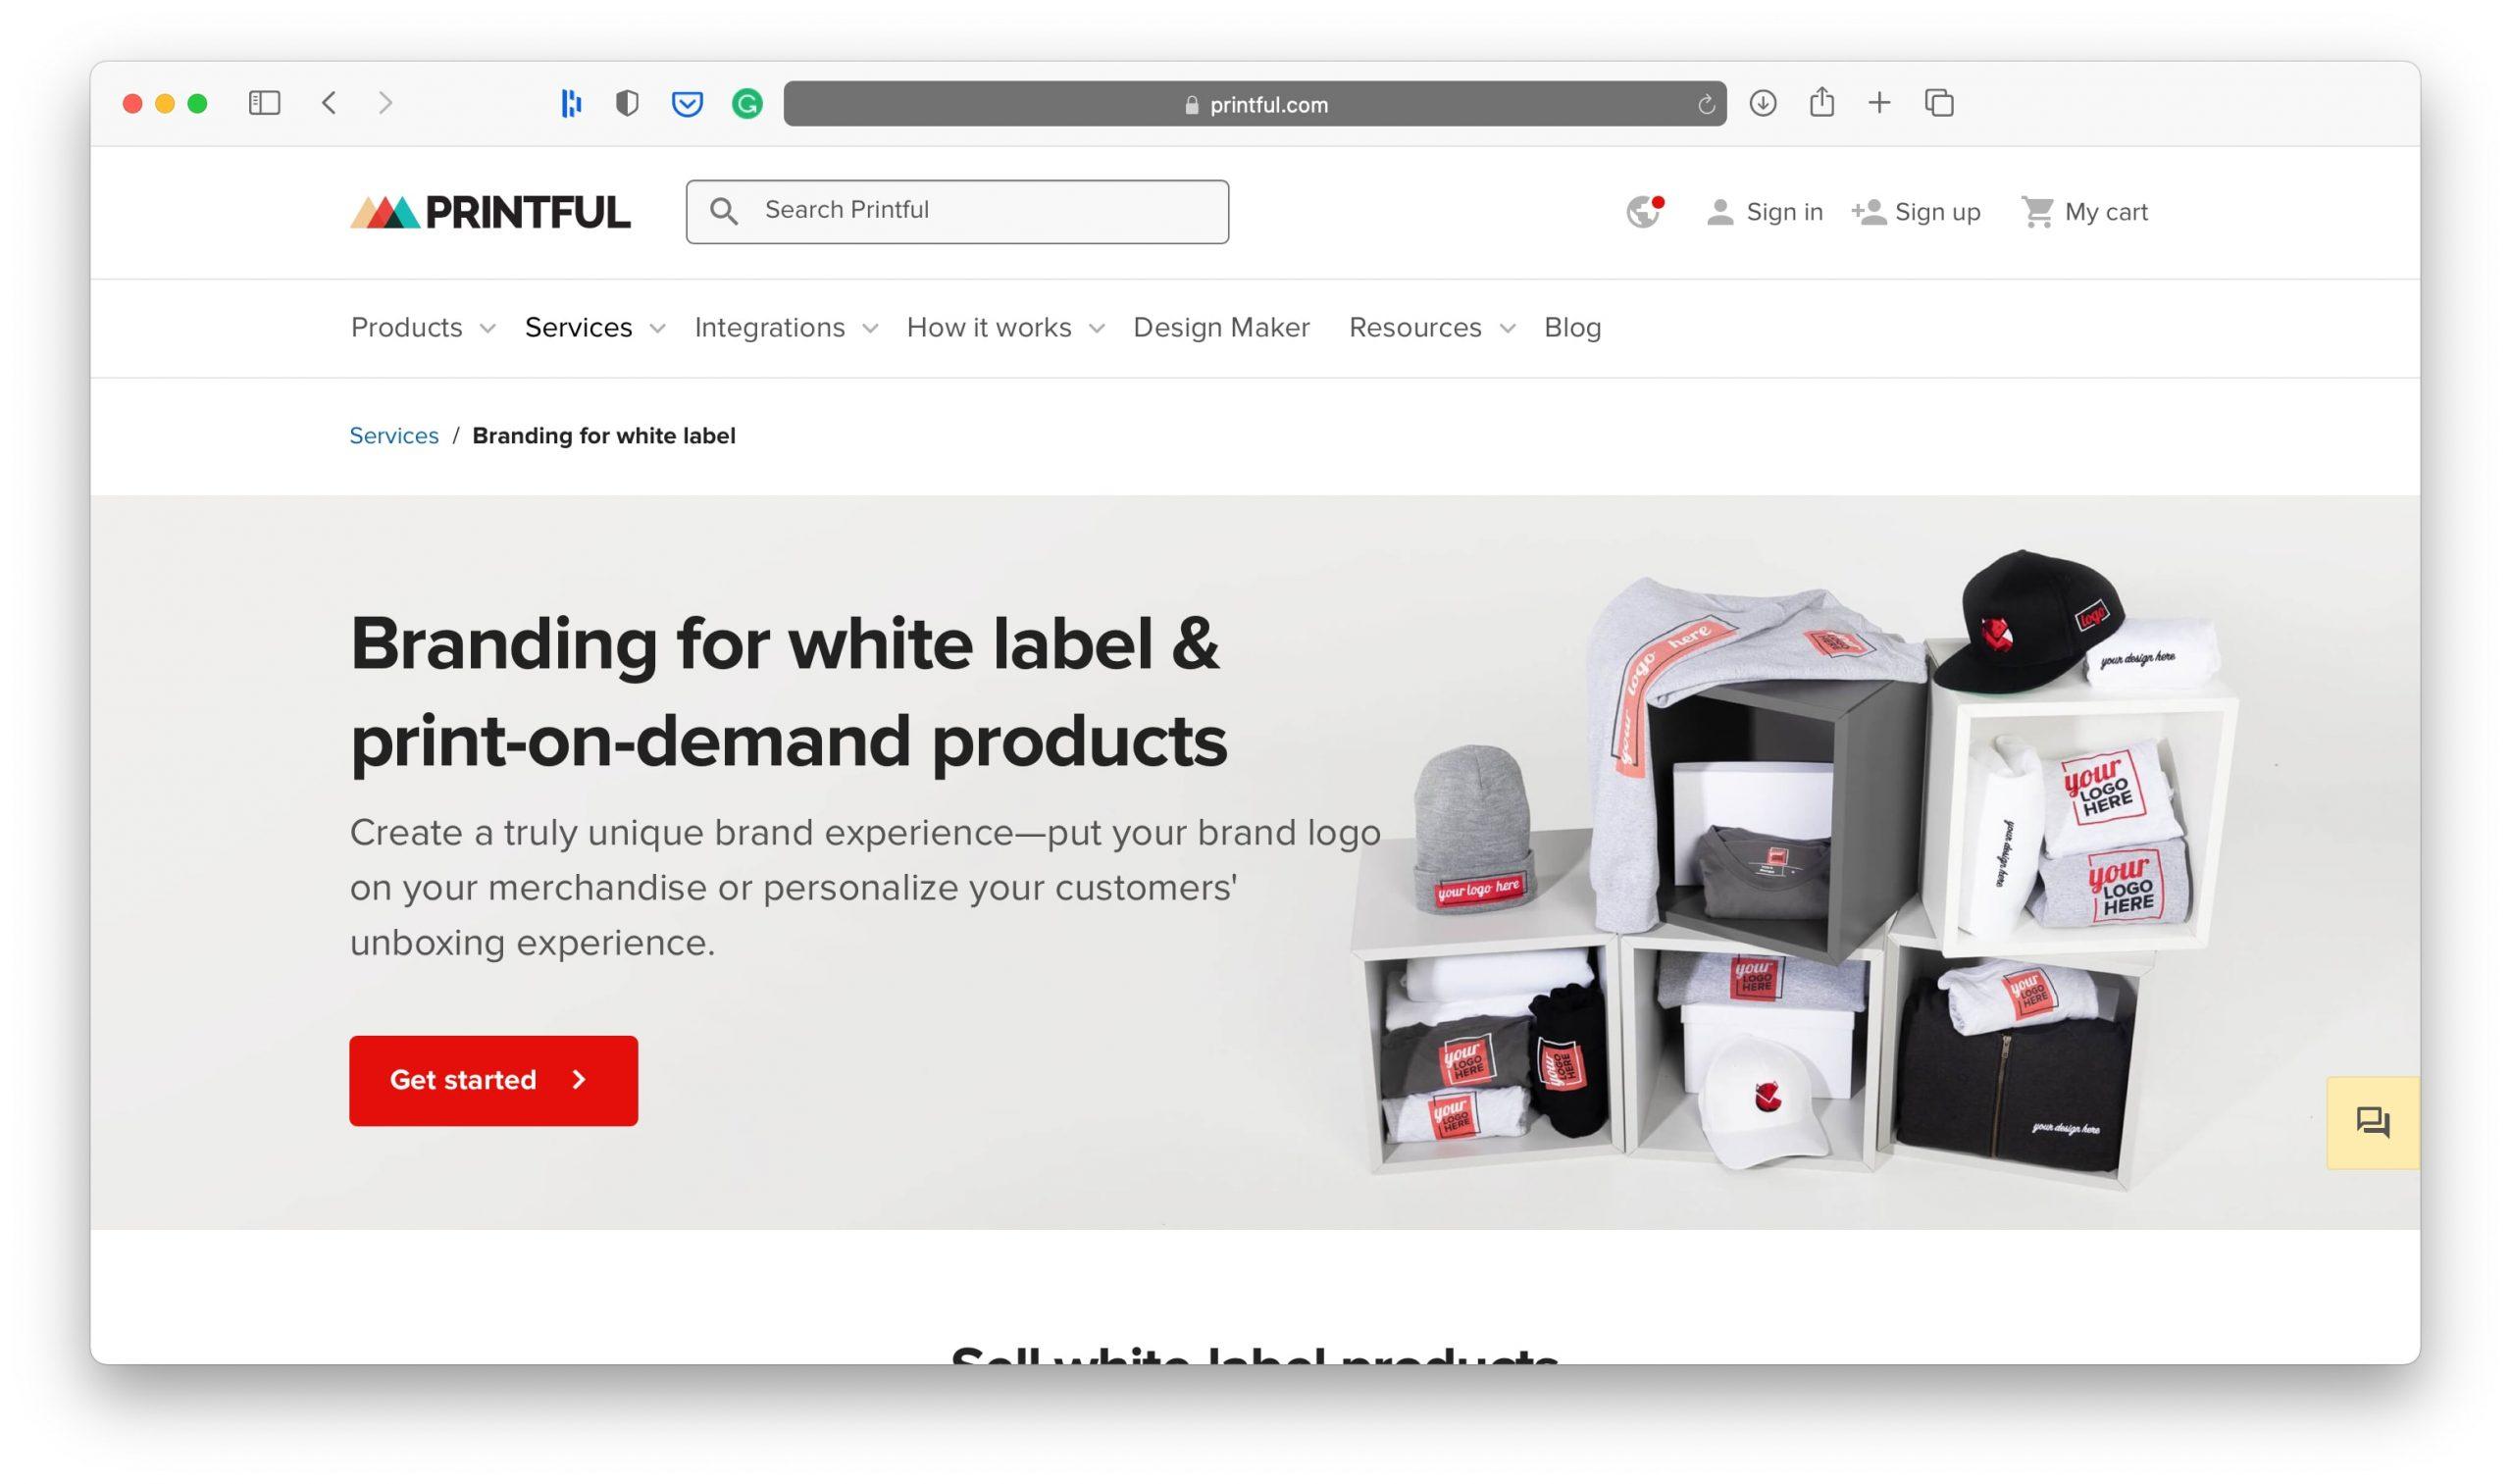 Printful Branding Services